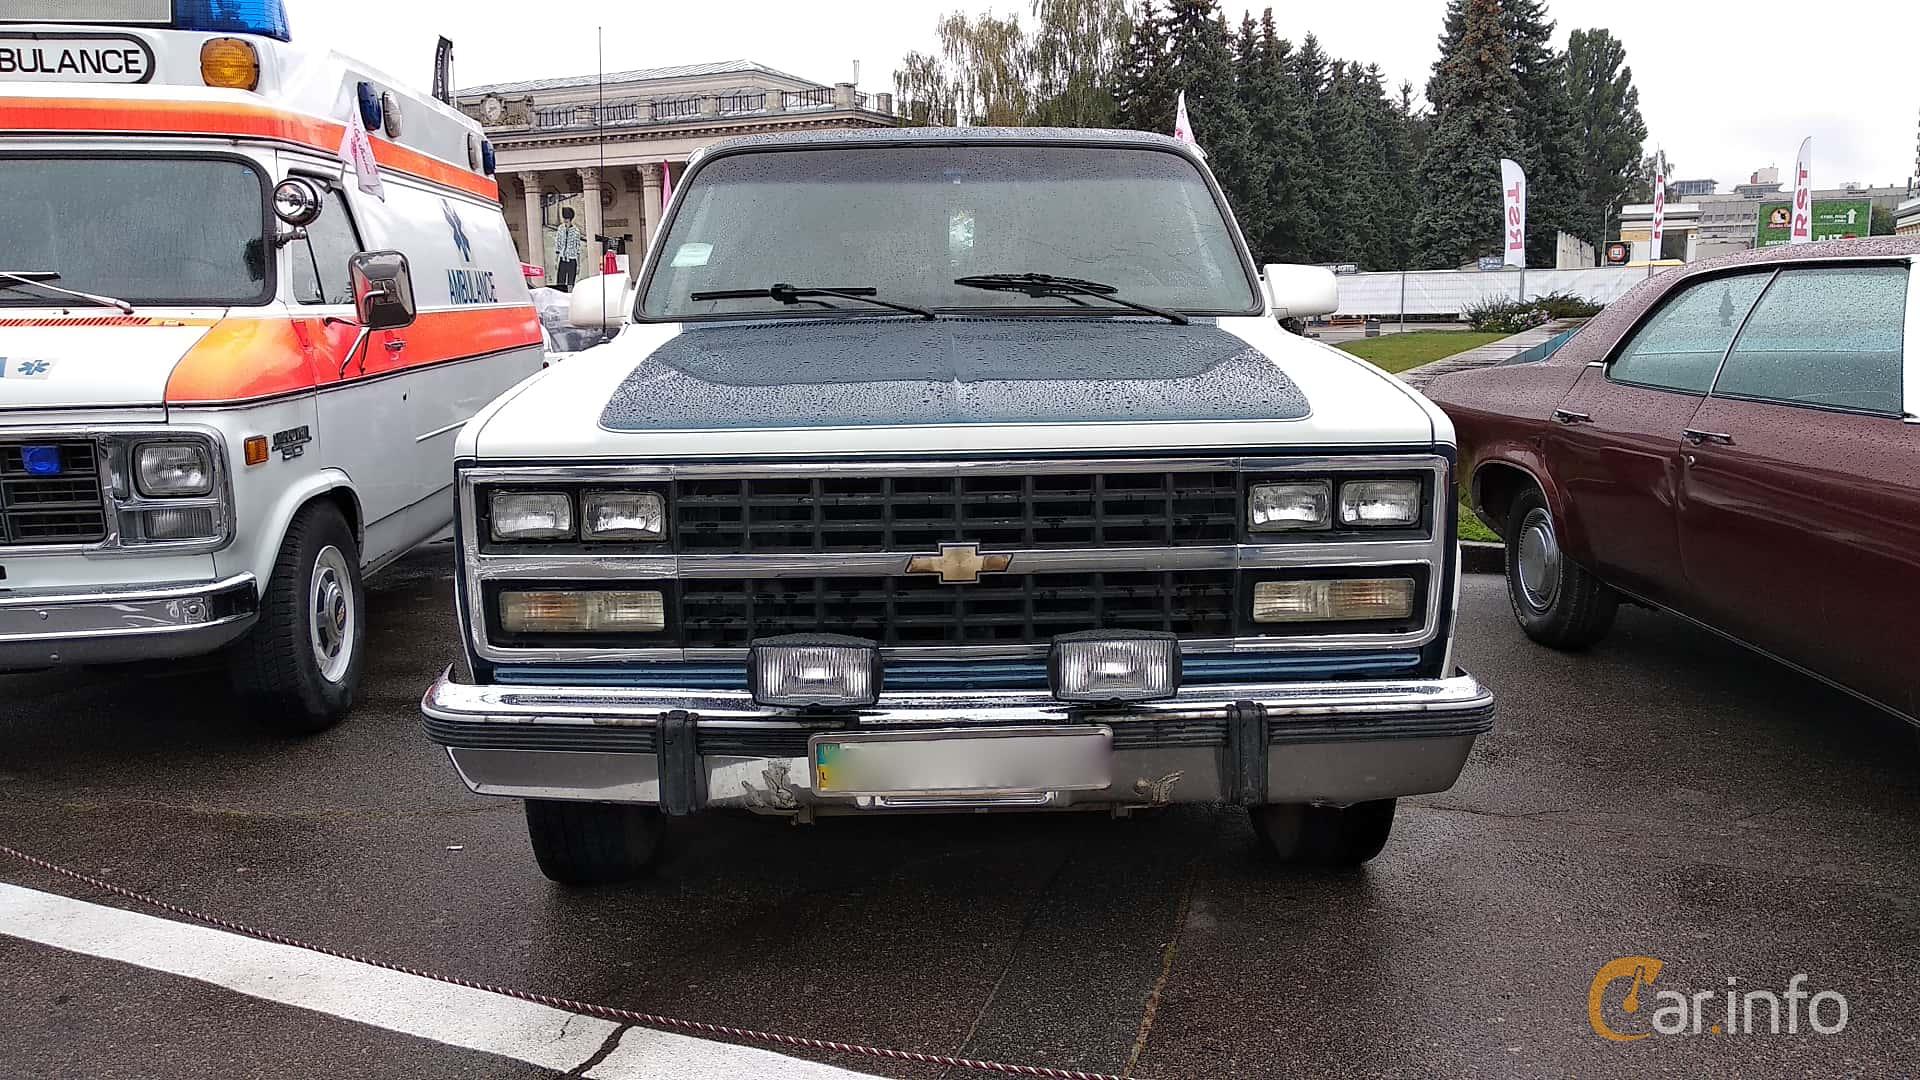 Chevrolet Suburban 4-door 1991 at Old Car Land no.2 2018